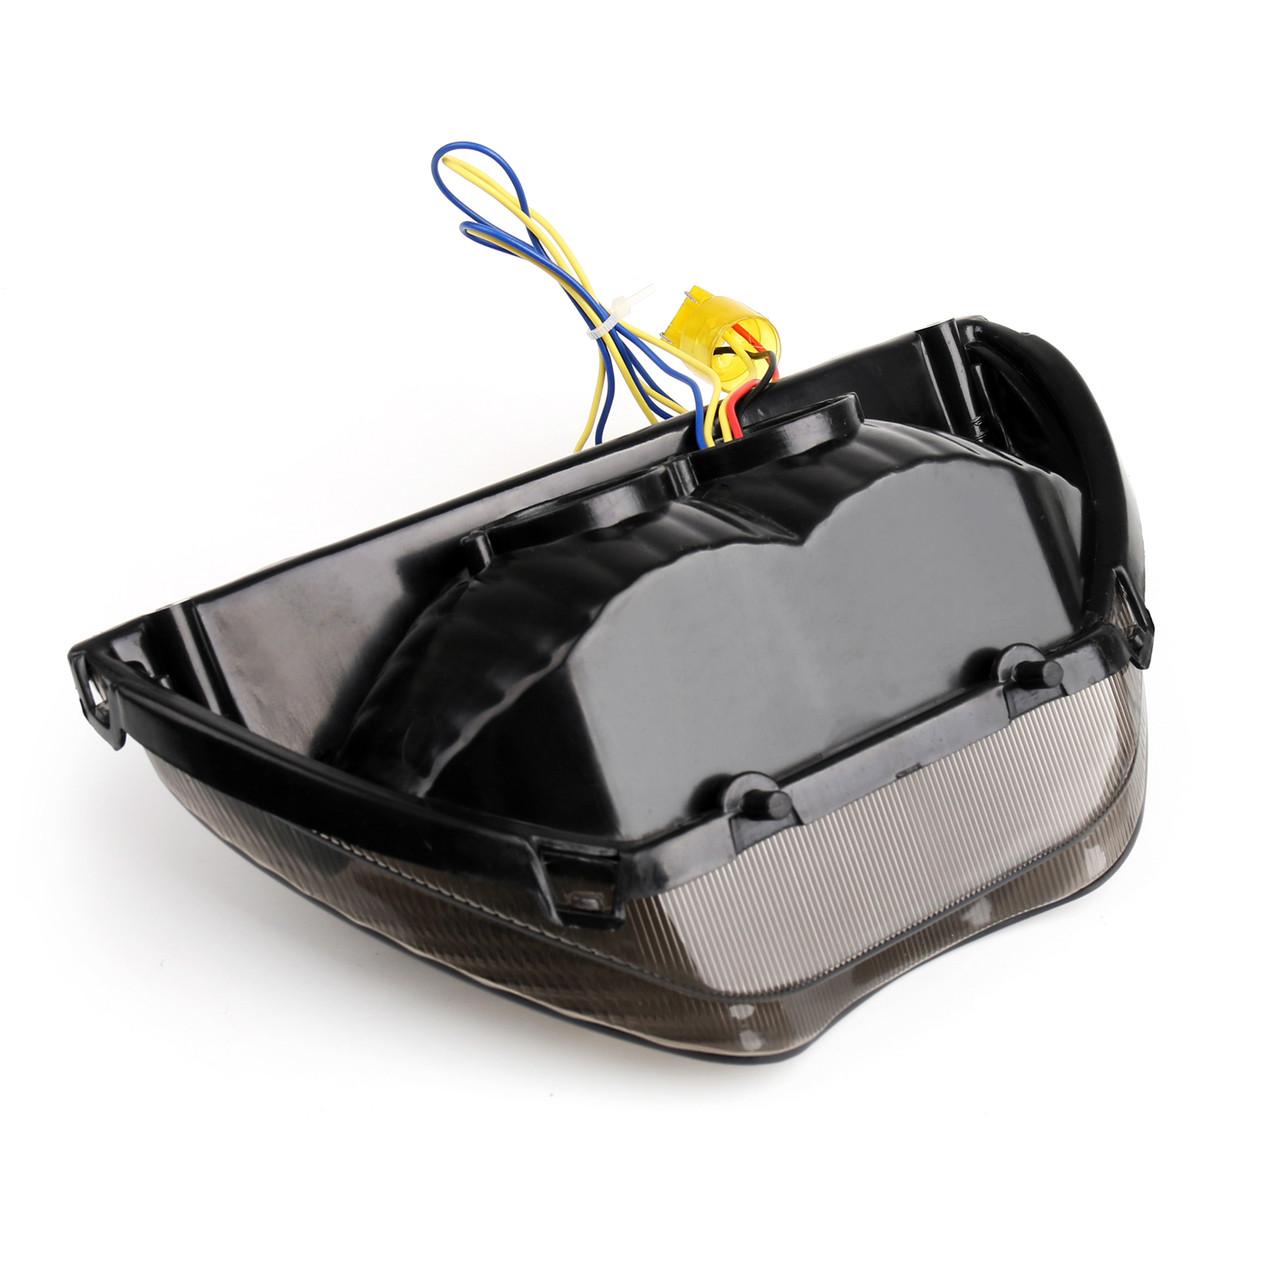 Integrated LED TailLight Turn Signals For Honda CBR 600 F4 F4i CBR 900 RR Smoke